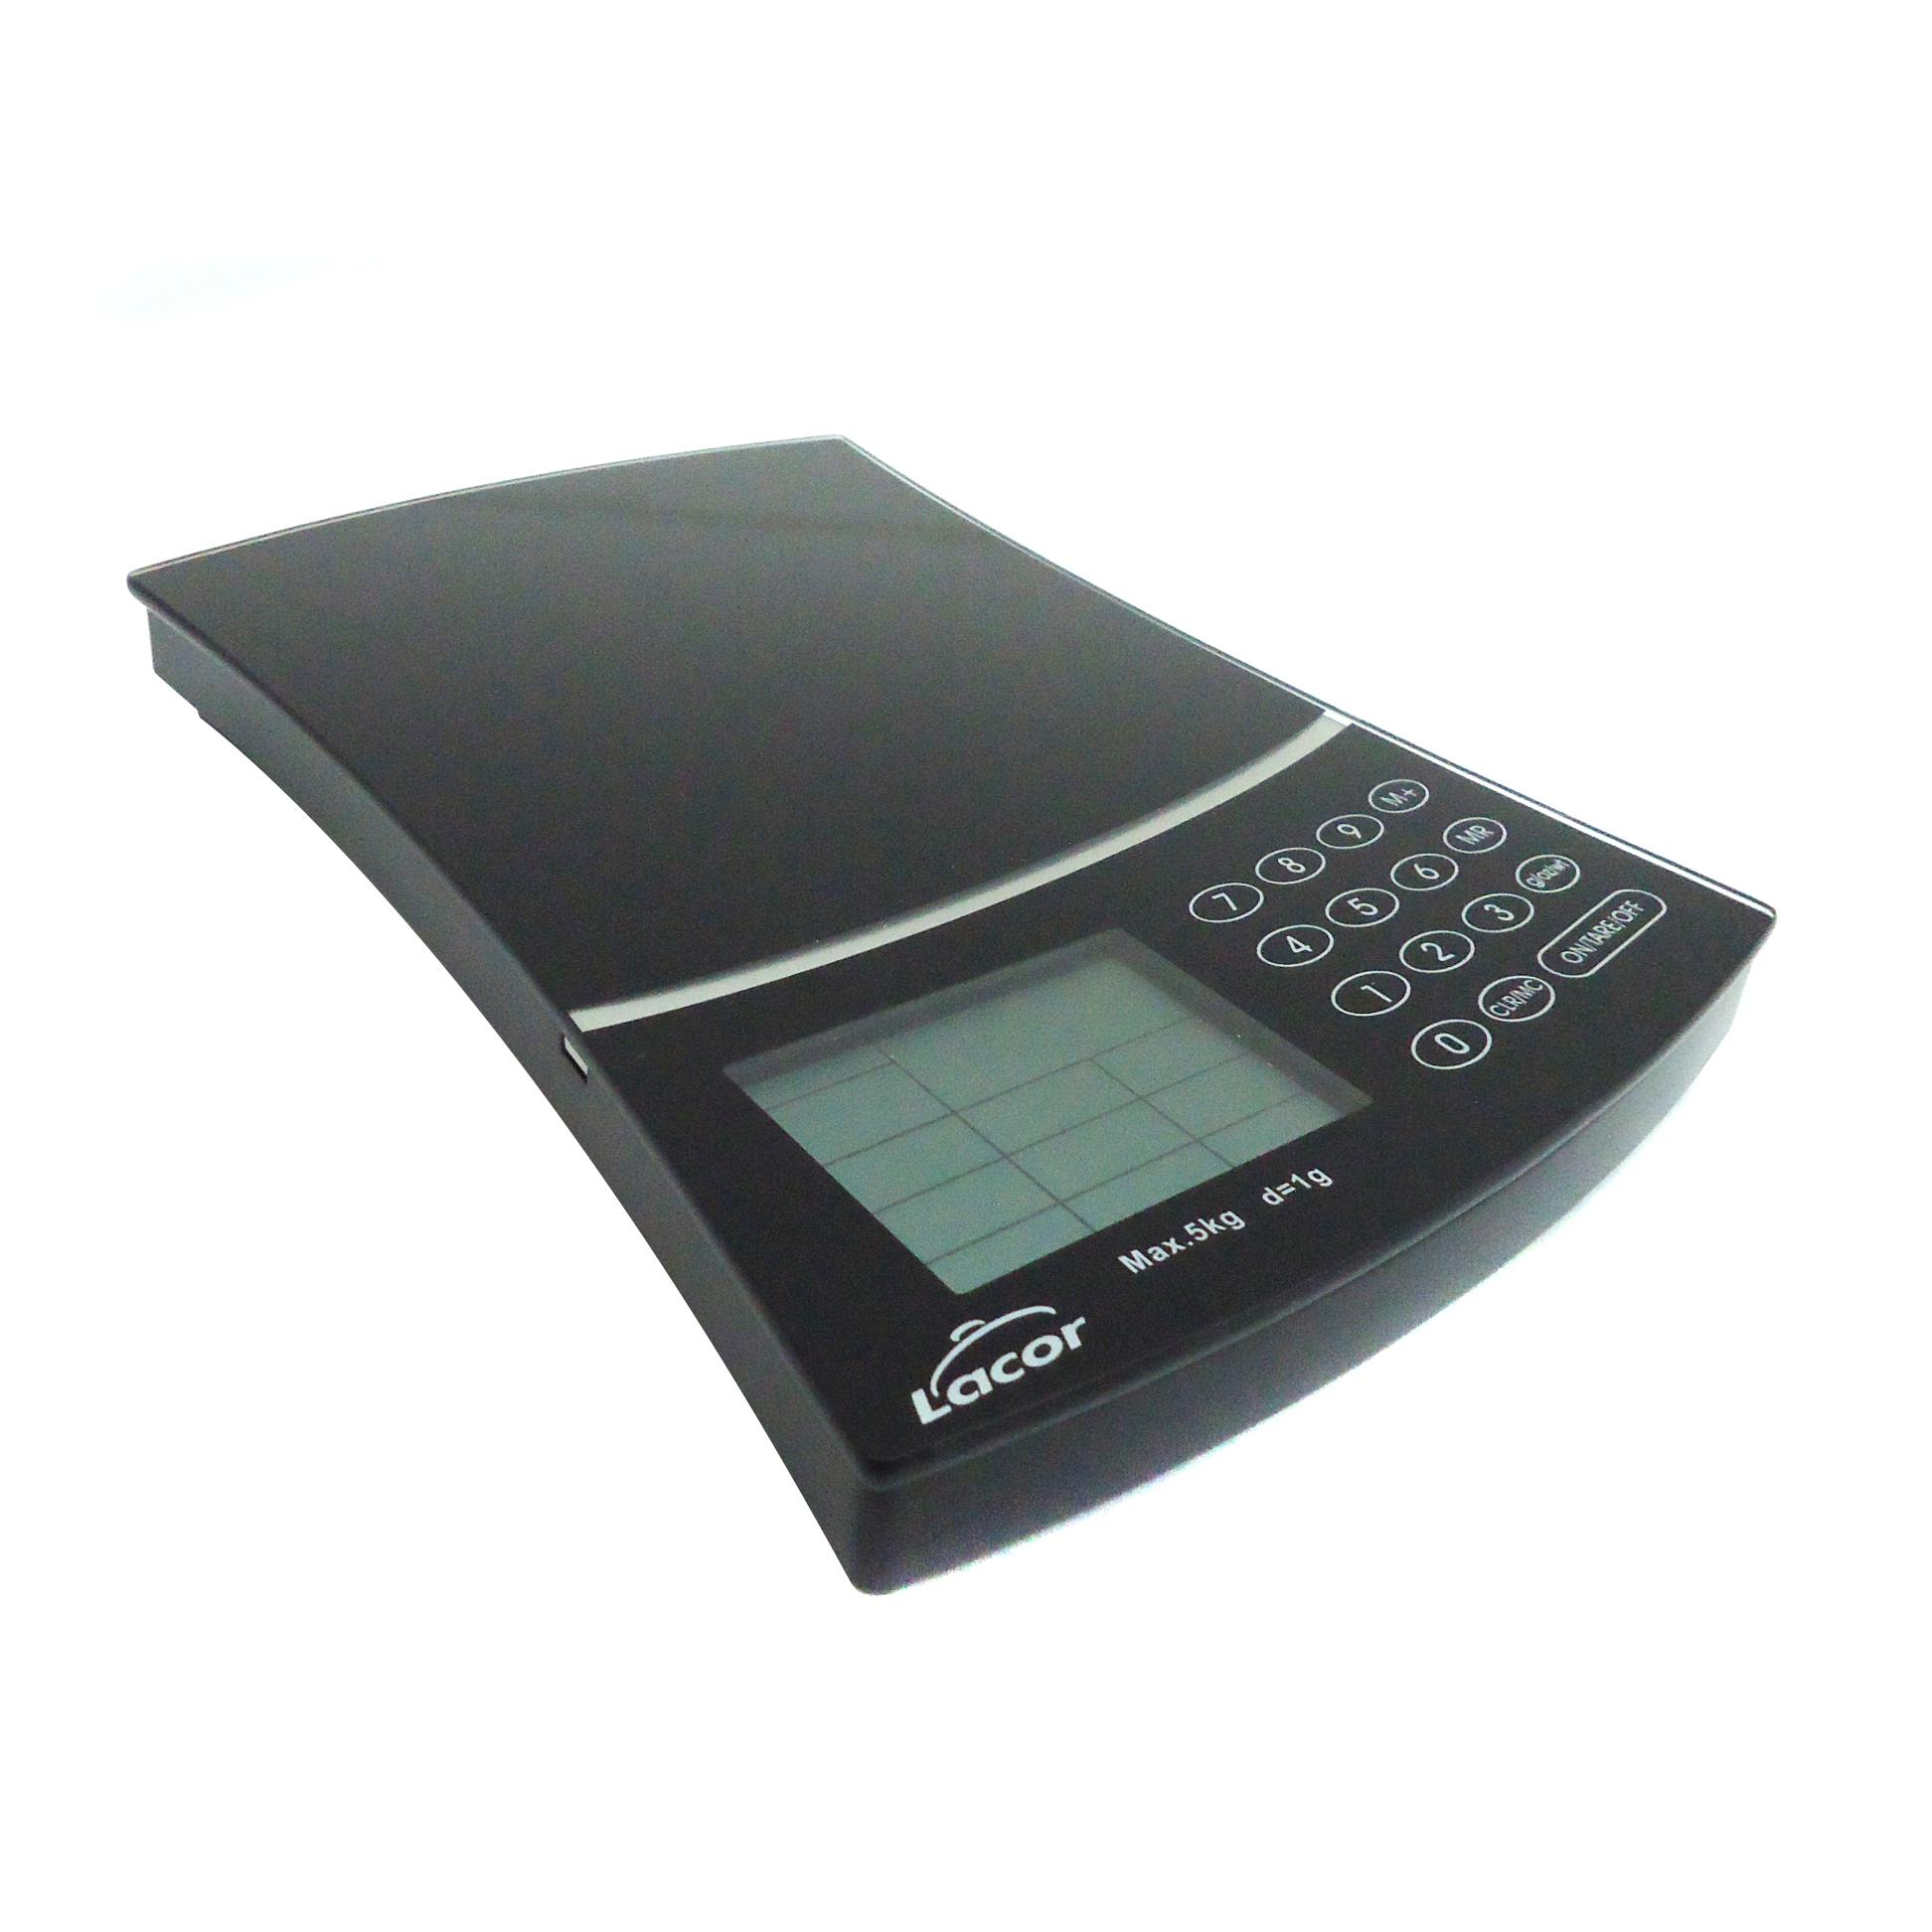 LACOR 61706 Ζυγαριά Ψηφιακή - Θερμιδομετρητής 5Kg/1gr επαγγελματικός εξοπλισμός   ζυγαριές   ζυγοί  επαγγελματικός εξοπλισμός   ζυγαρι